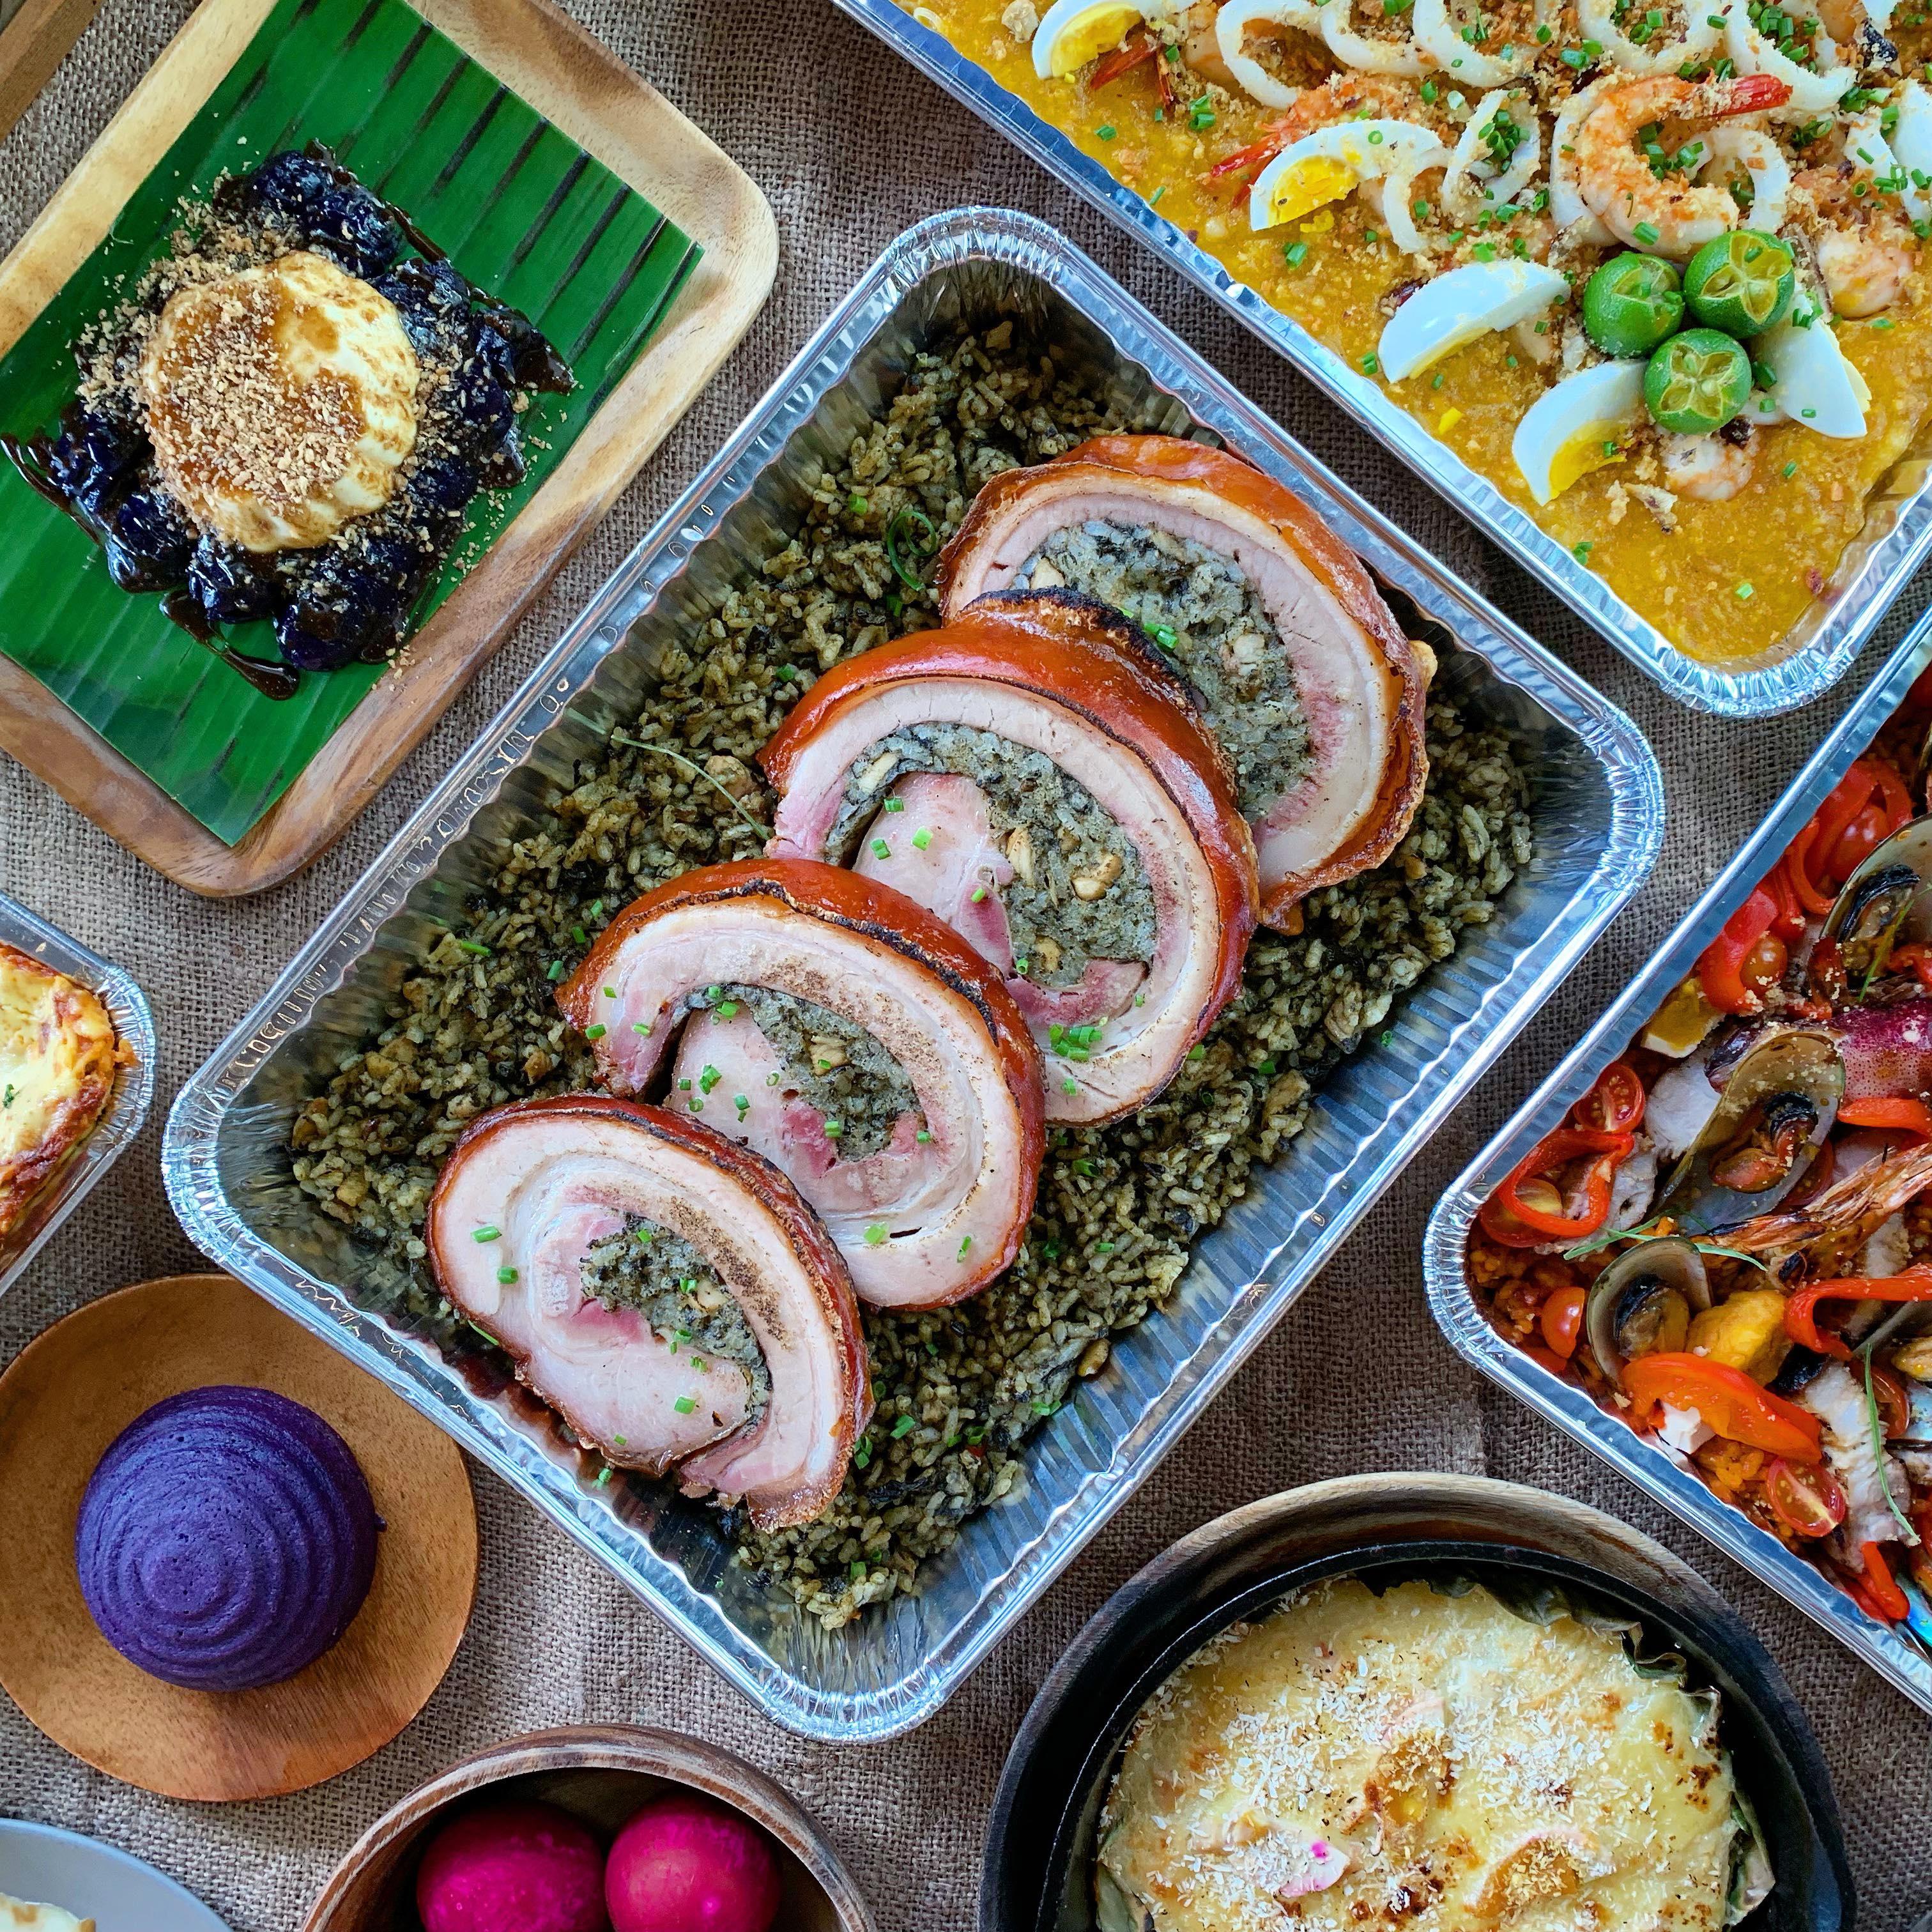 Empacho S Filipino Party Trays Filipino Food Blogger Always Hungry Ph